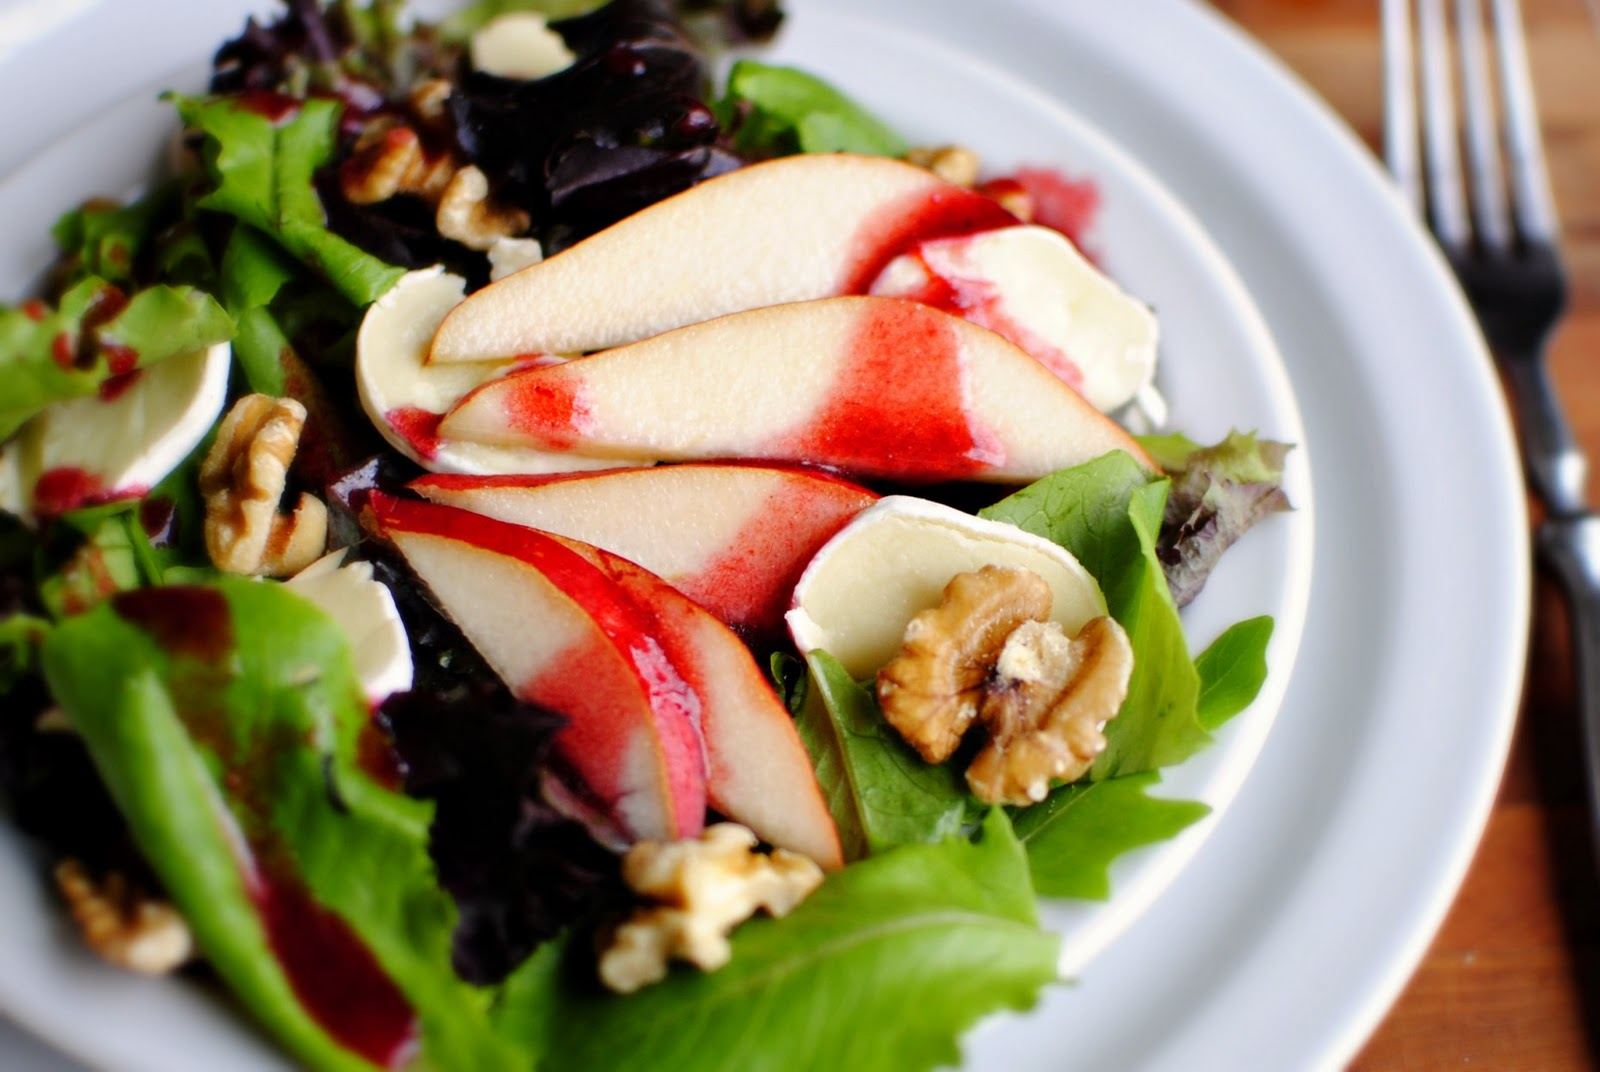 Blackberry Salad With Blackberry Vinaigrette Recipes — Dishmaps